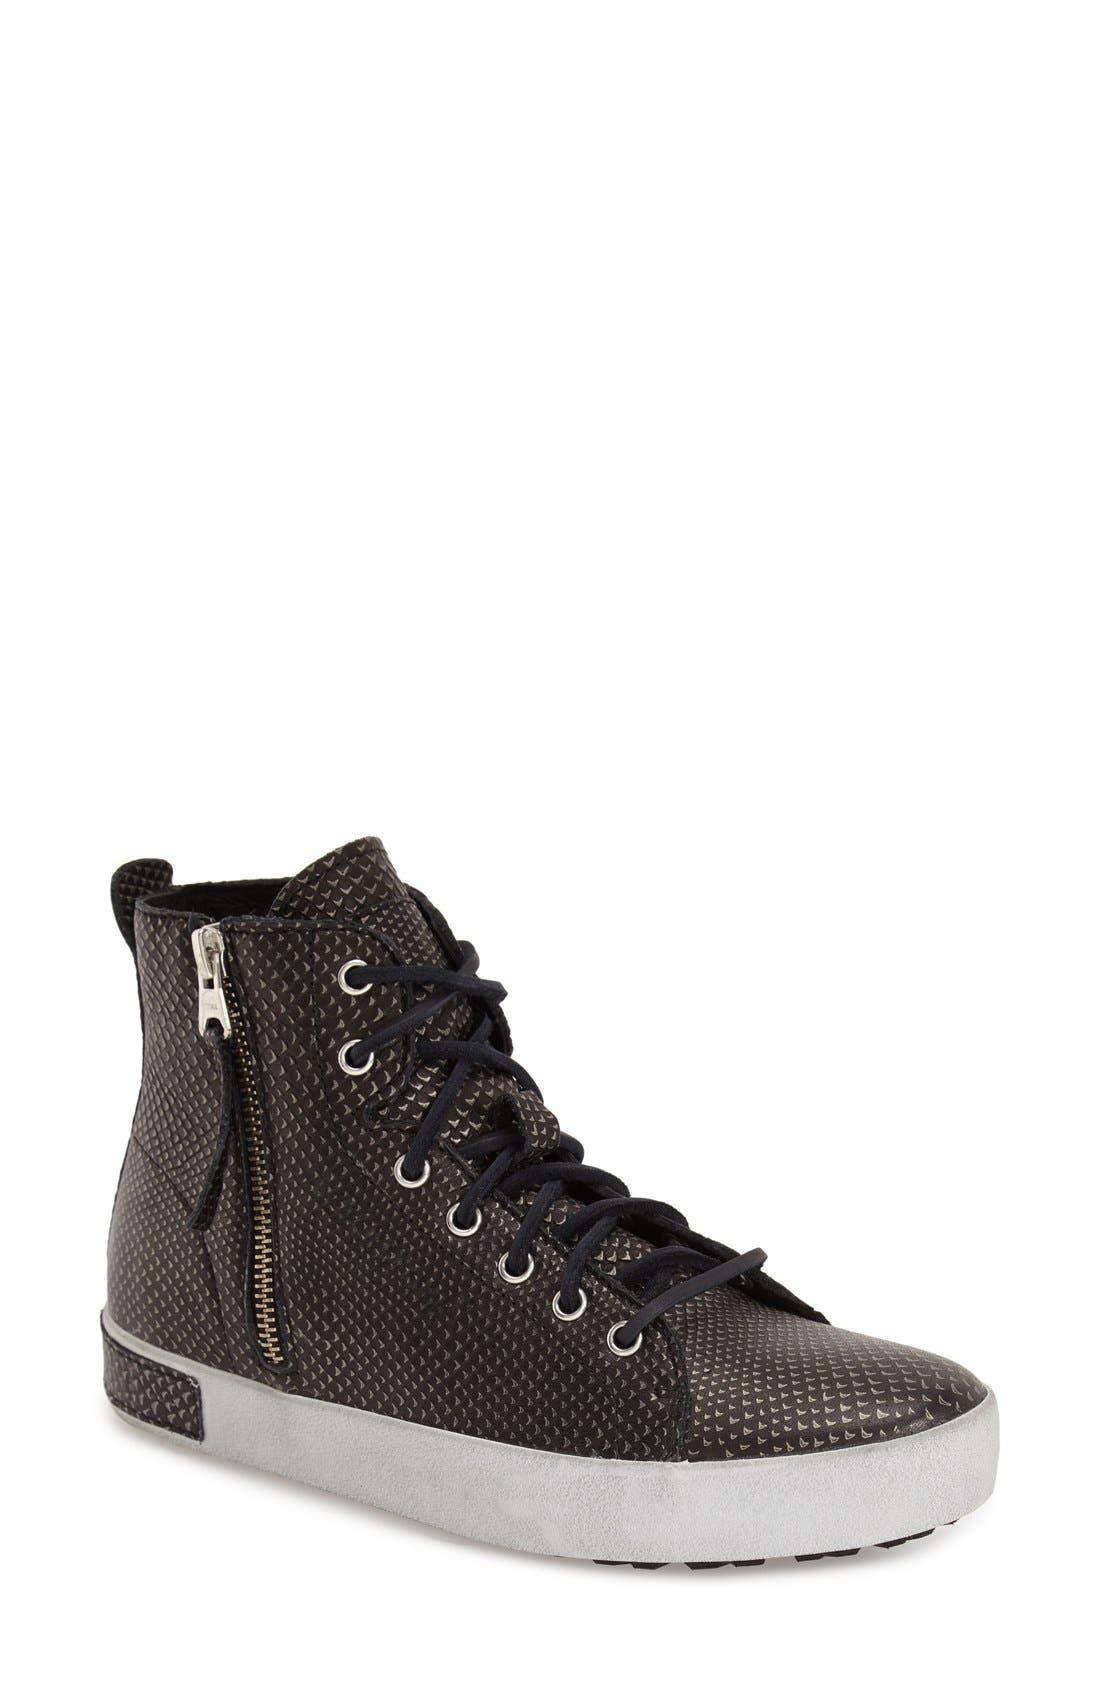 BLACKSTONE,                             'KL57' High Top Sneaker,                             Main thumbnail 1, color,                             006